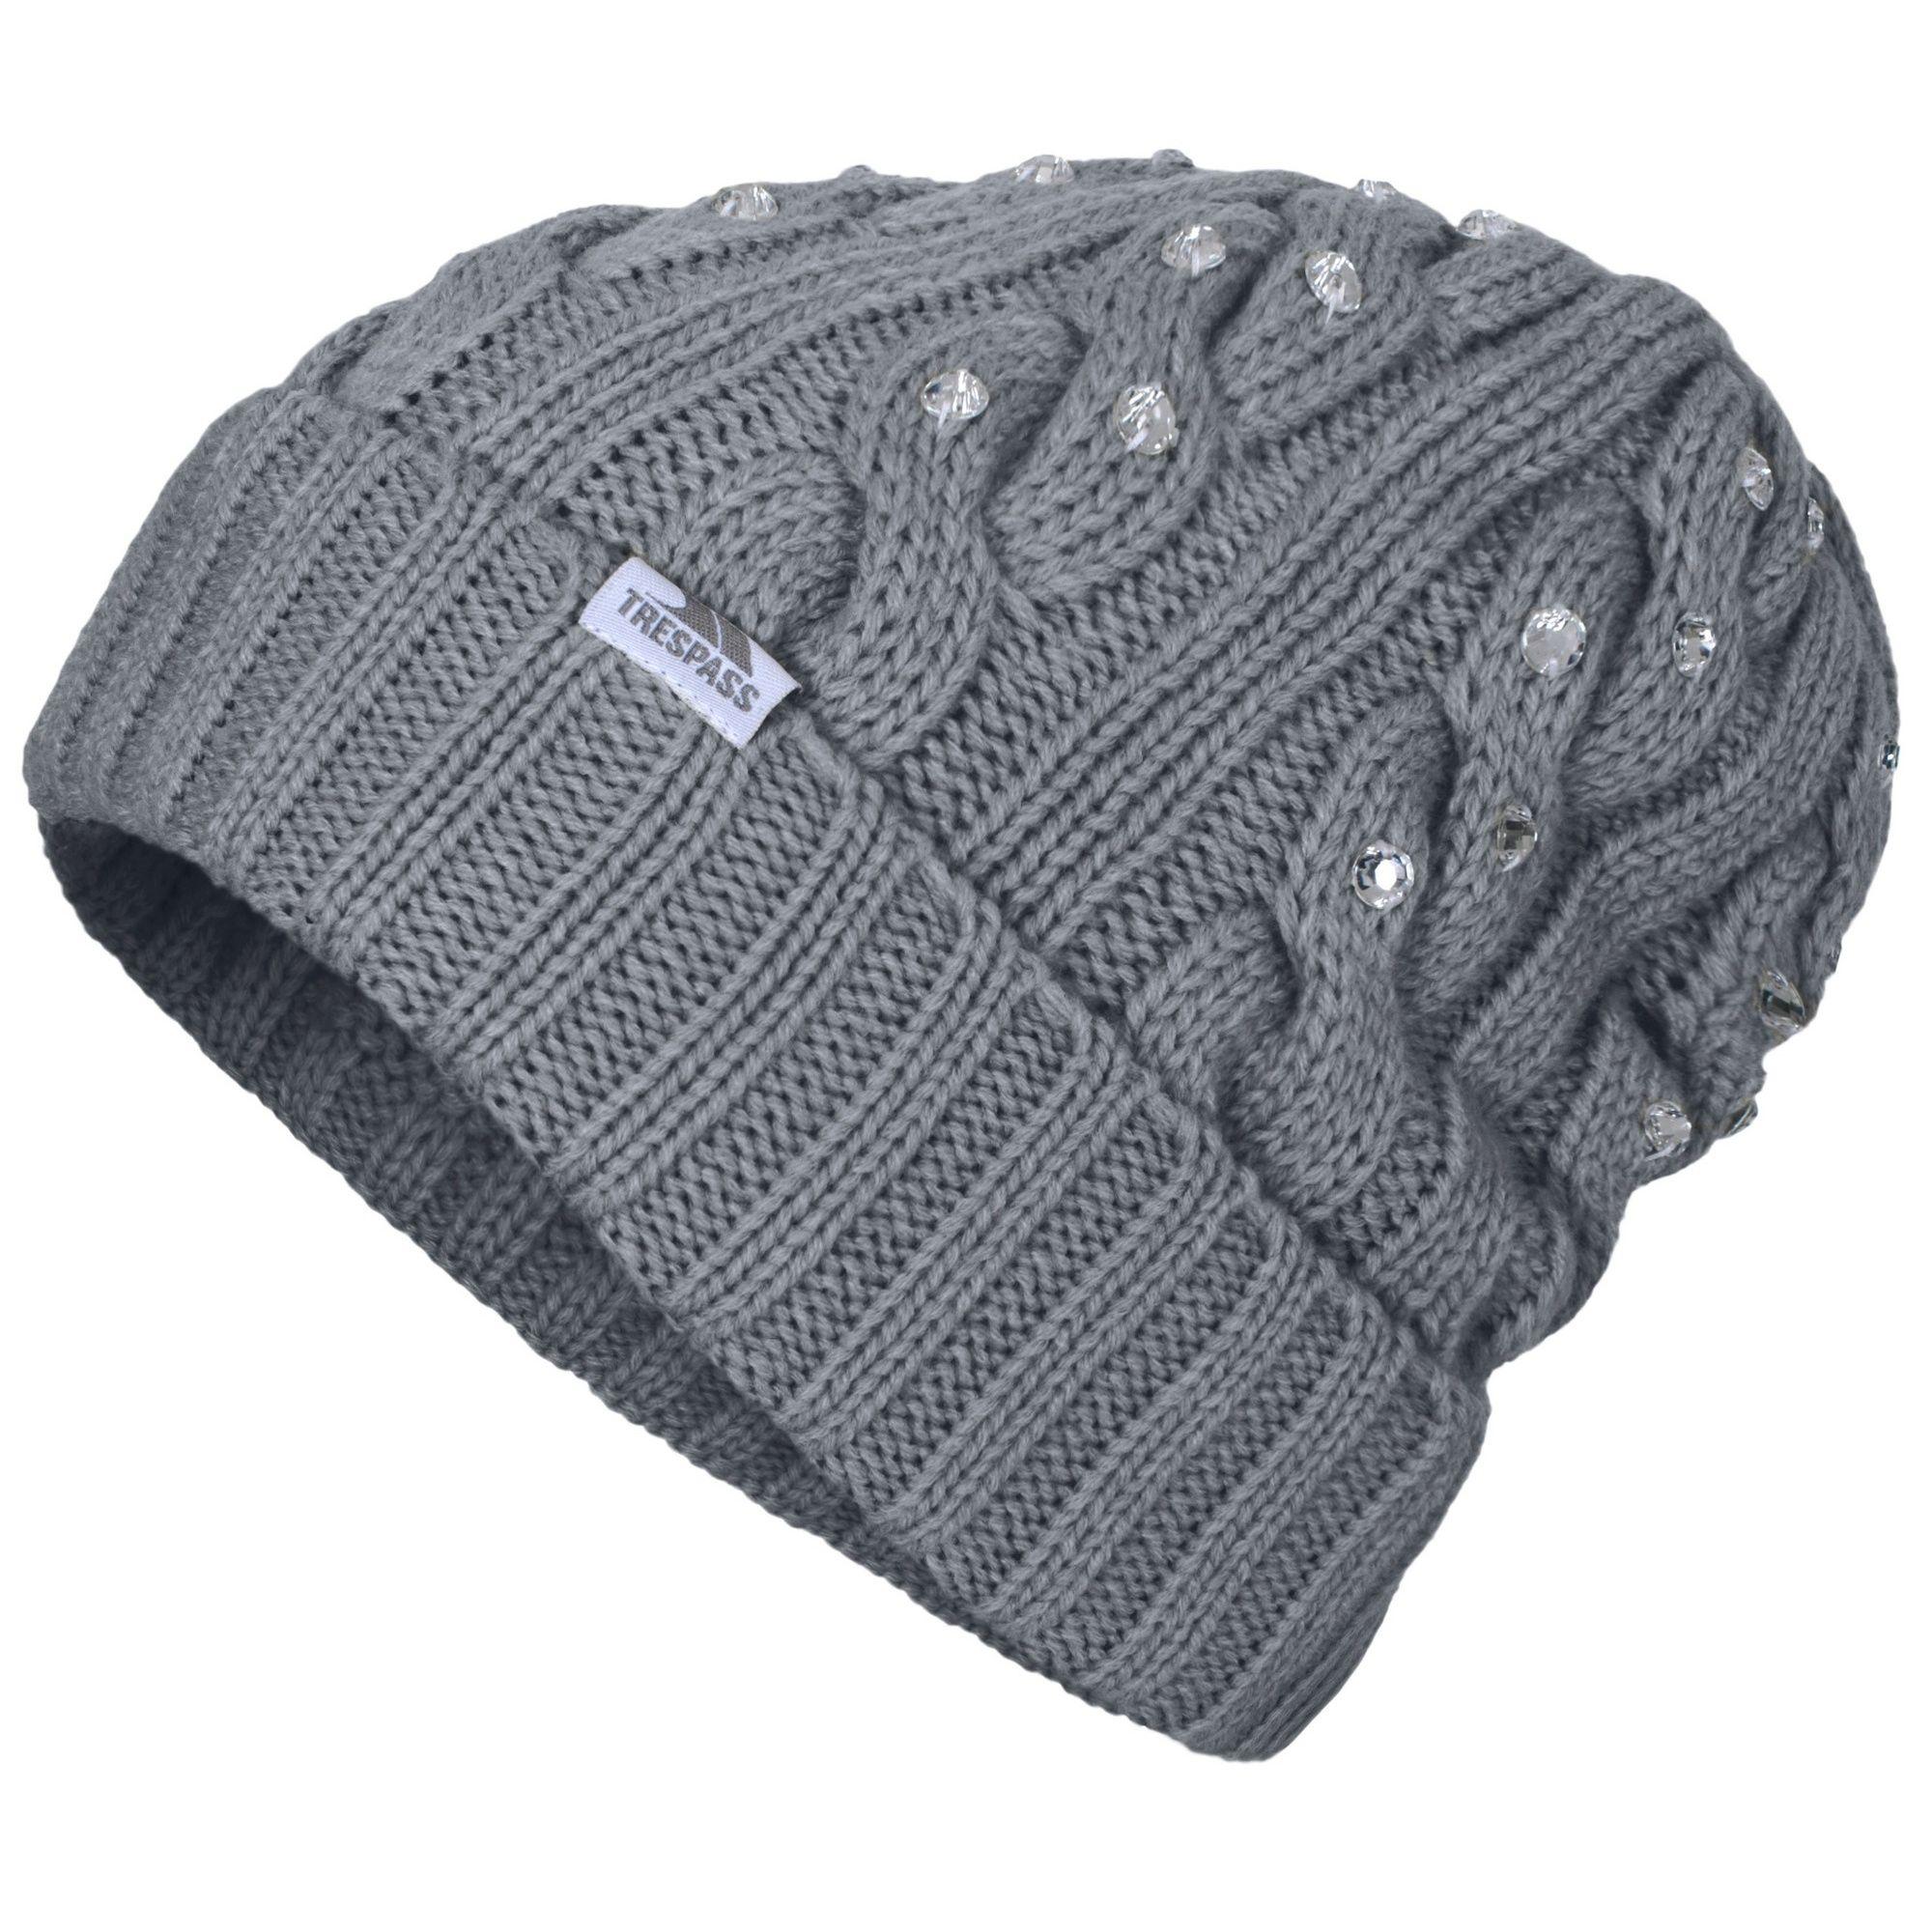 Trespass Womens/Ladies Litzy Embellished Beanie Hat